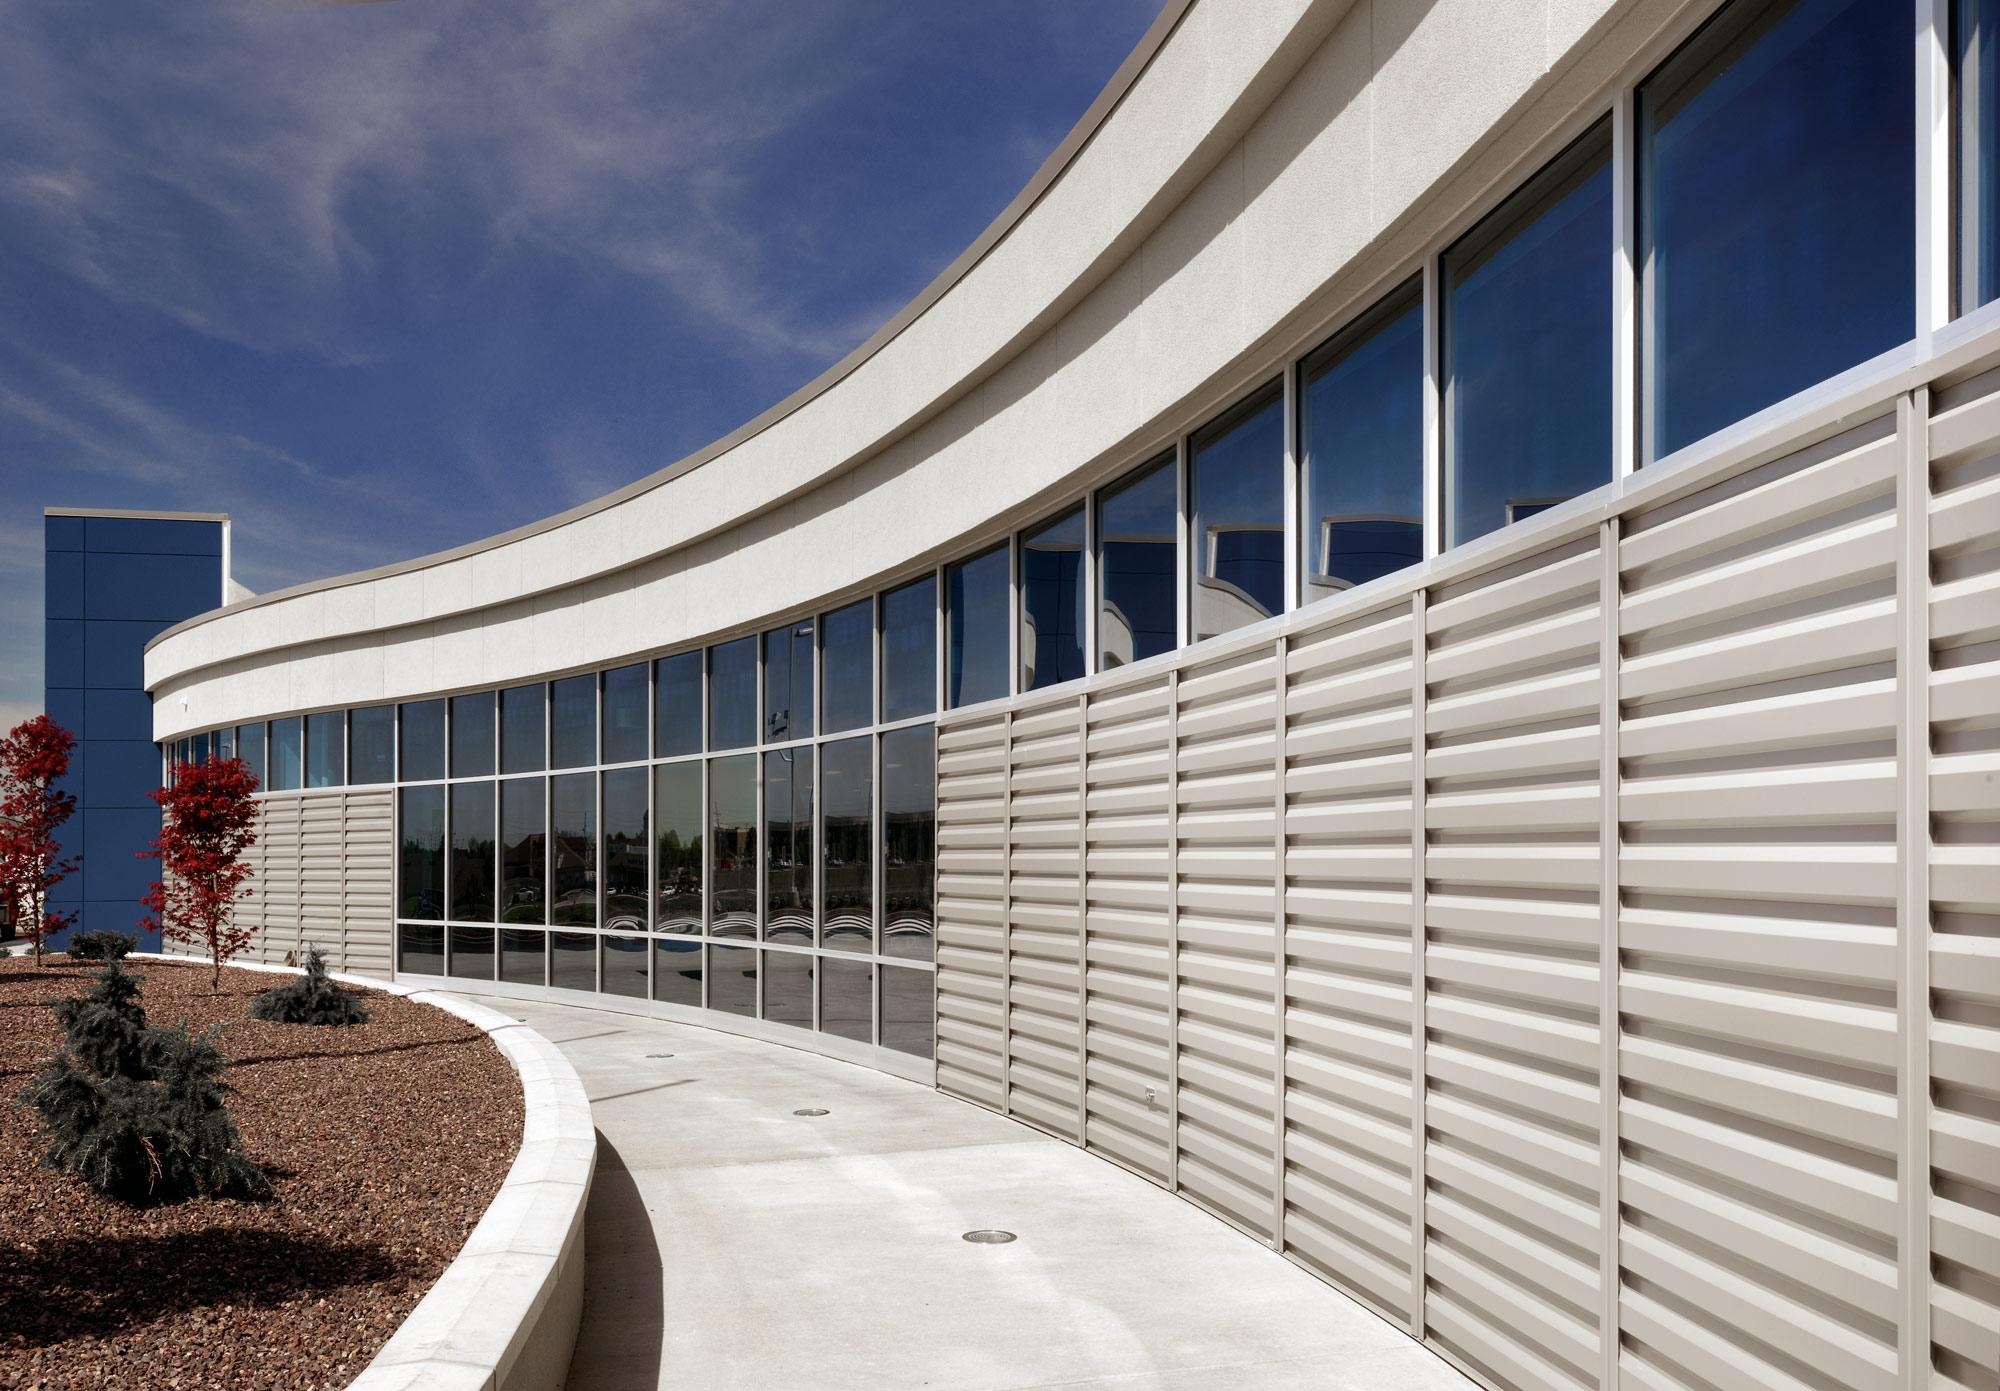 Fieldhouse-Sportscenter-H-Design-Exterior-02.jpg